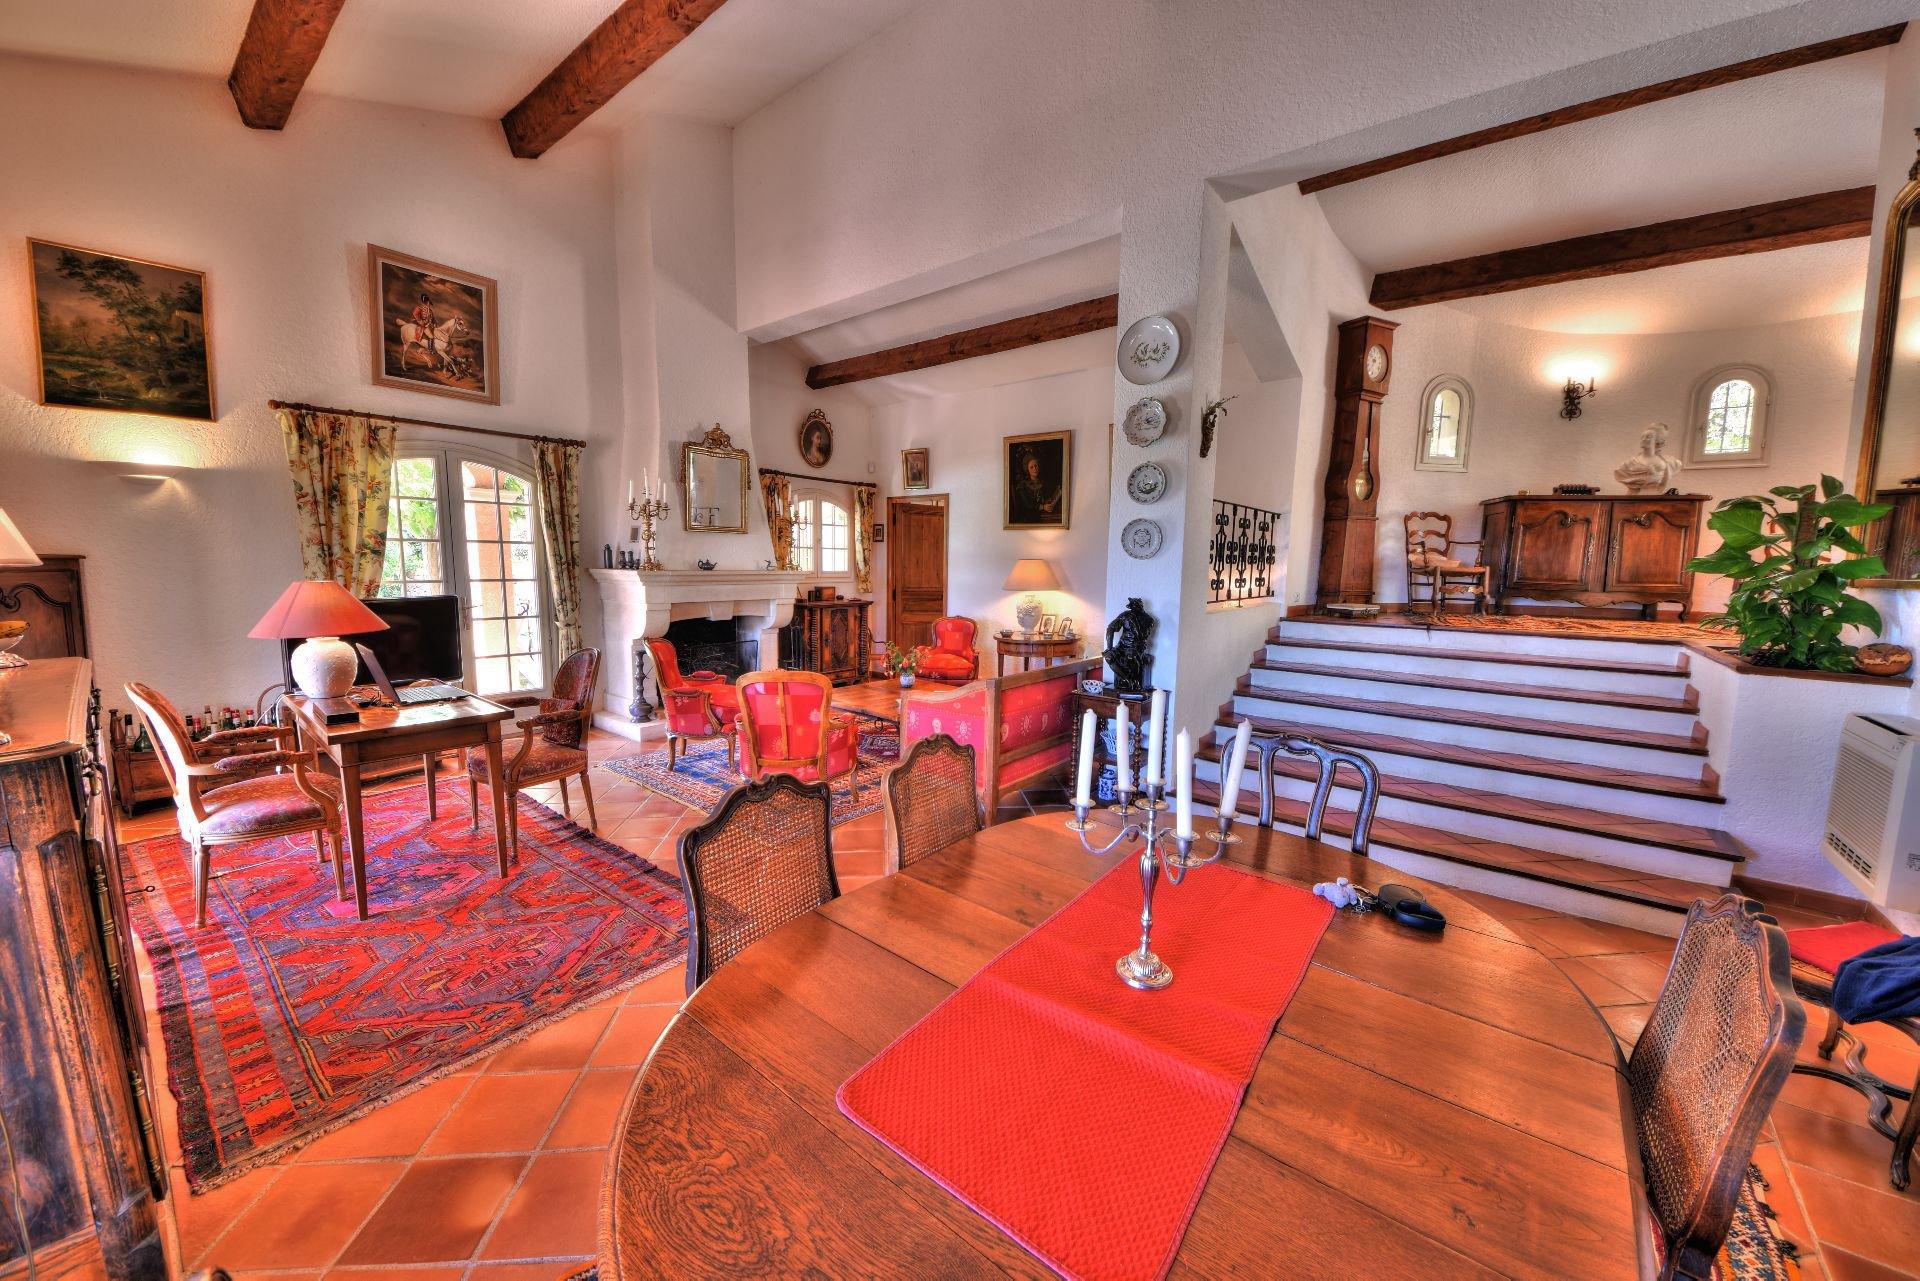 Living-room, natural light, fireplace, high ceiling, tile